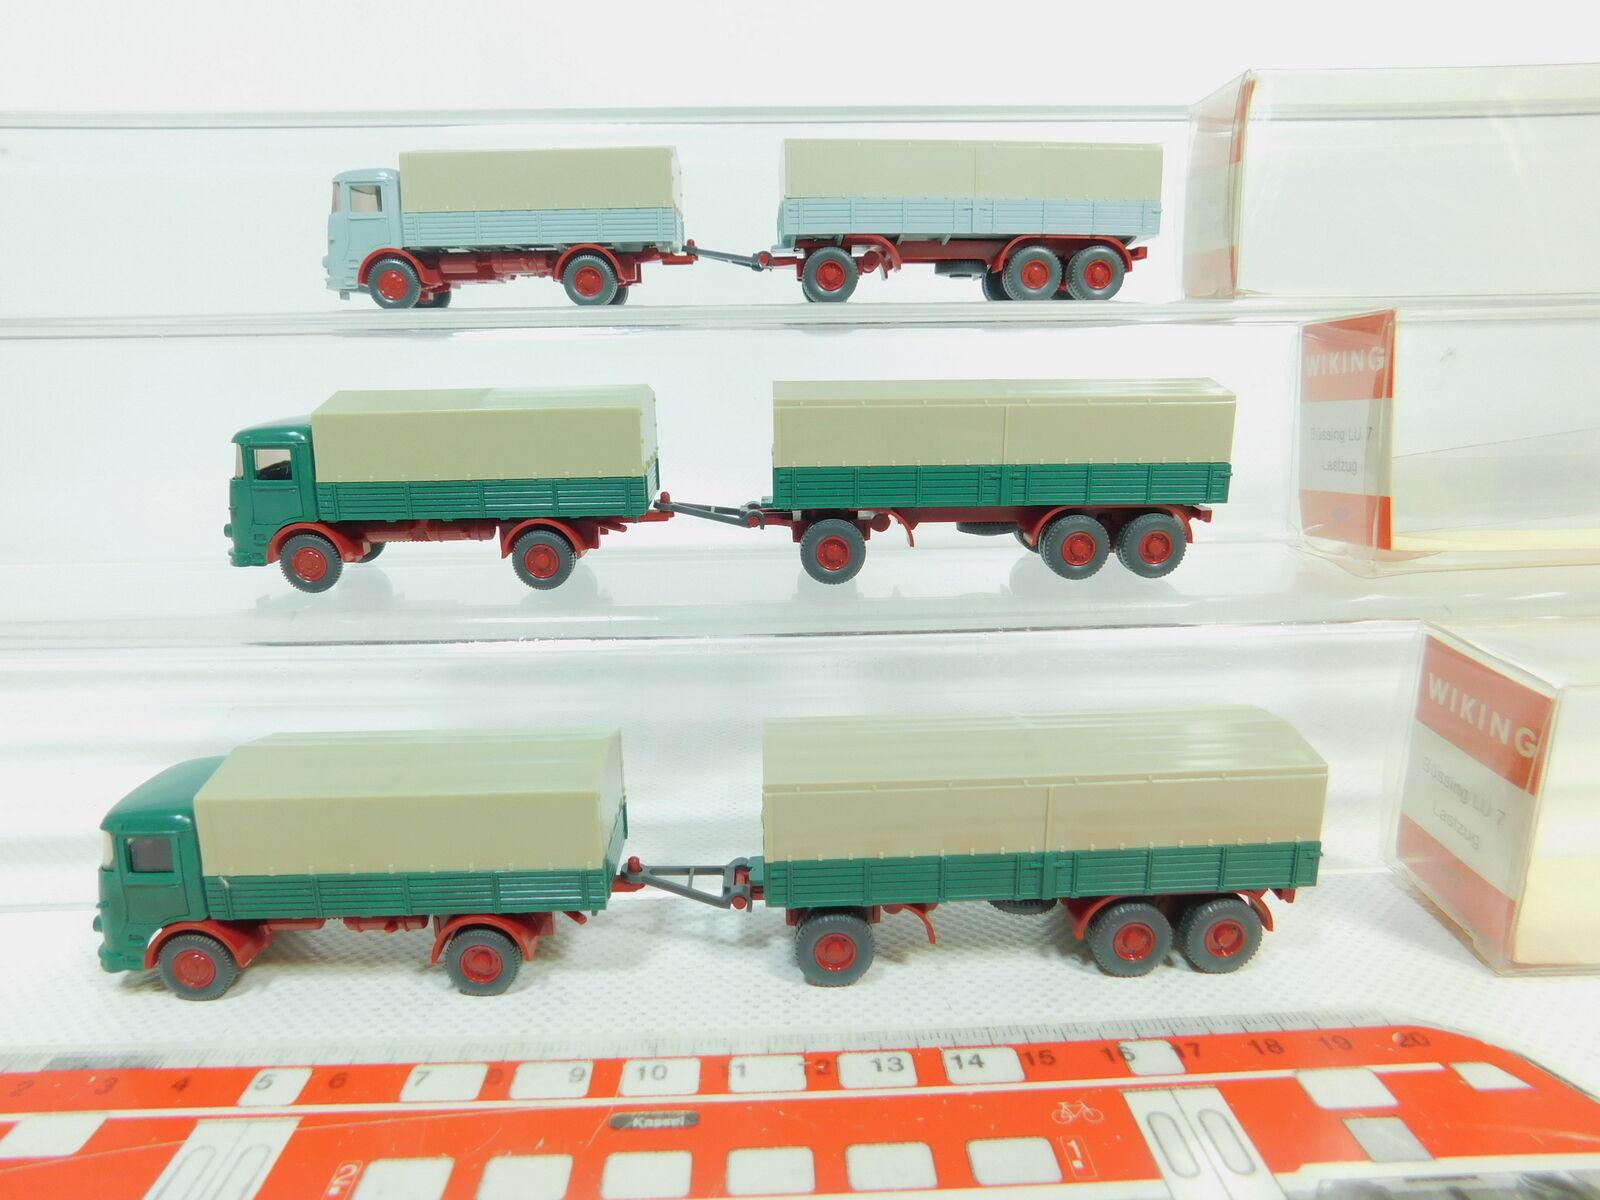 BO754-0,5  3x Wiking H0 1 87 477 Lastzug LKW Modell Büssing LU 7, sehr gut+OVP